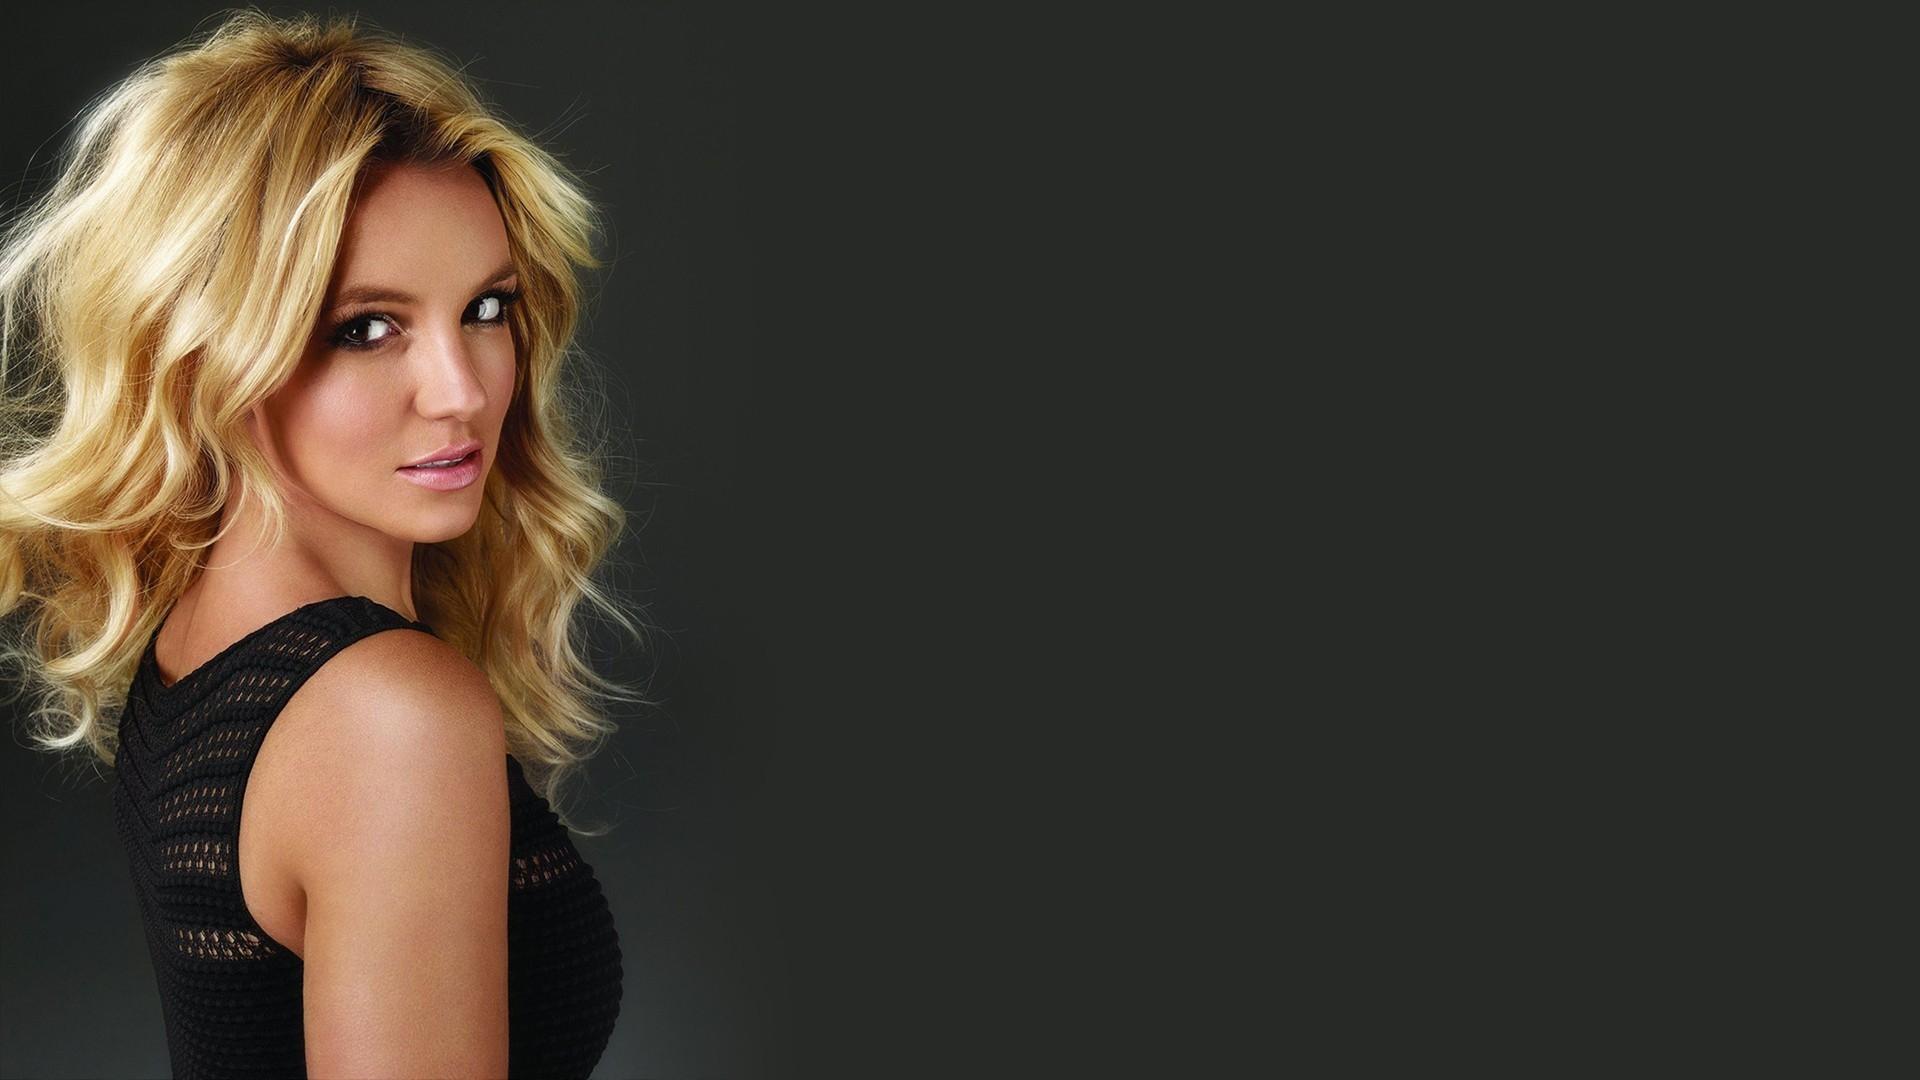 Wallpaper Long Hair Dress Supermodel Britney Spears Girl Beauty Background Blond Computer Wallpaper Photo Shoot Brown Hair Human Hair Color Haircut Fashion Model Flash Photography 1920x1080 4kwallpaper 790135 Hd Wallpapers Wallhere